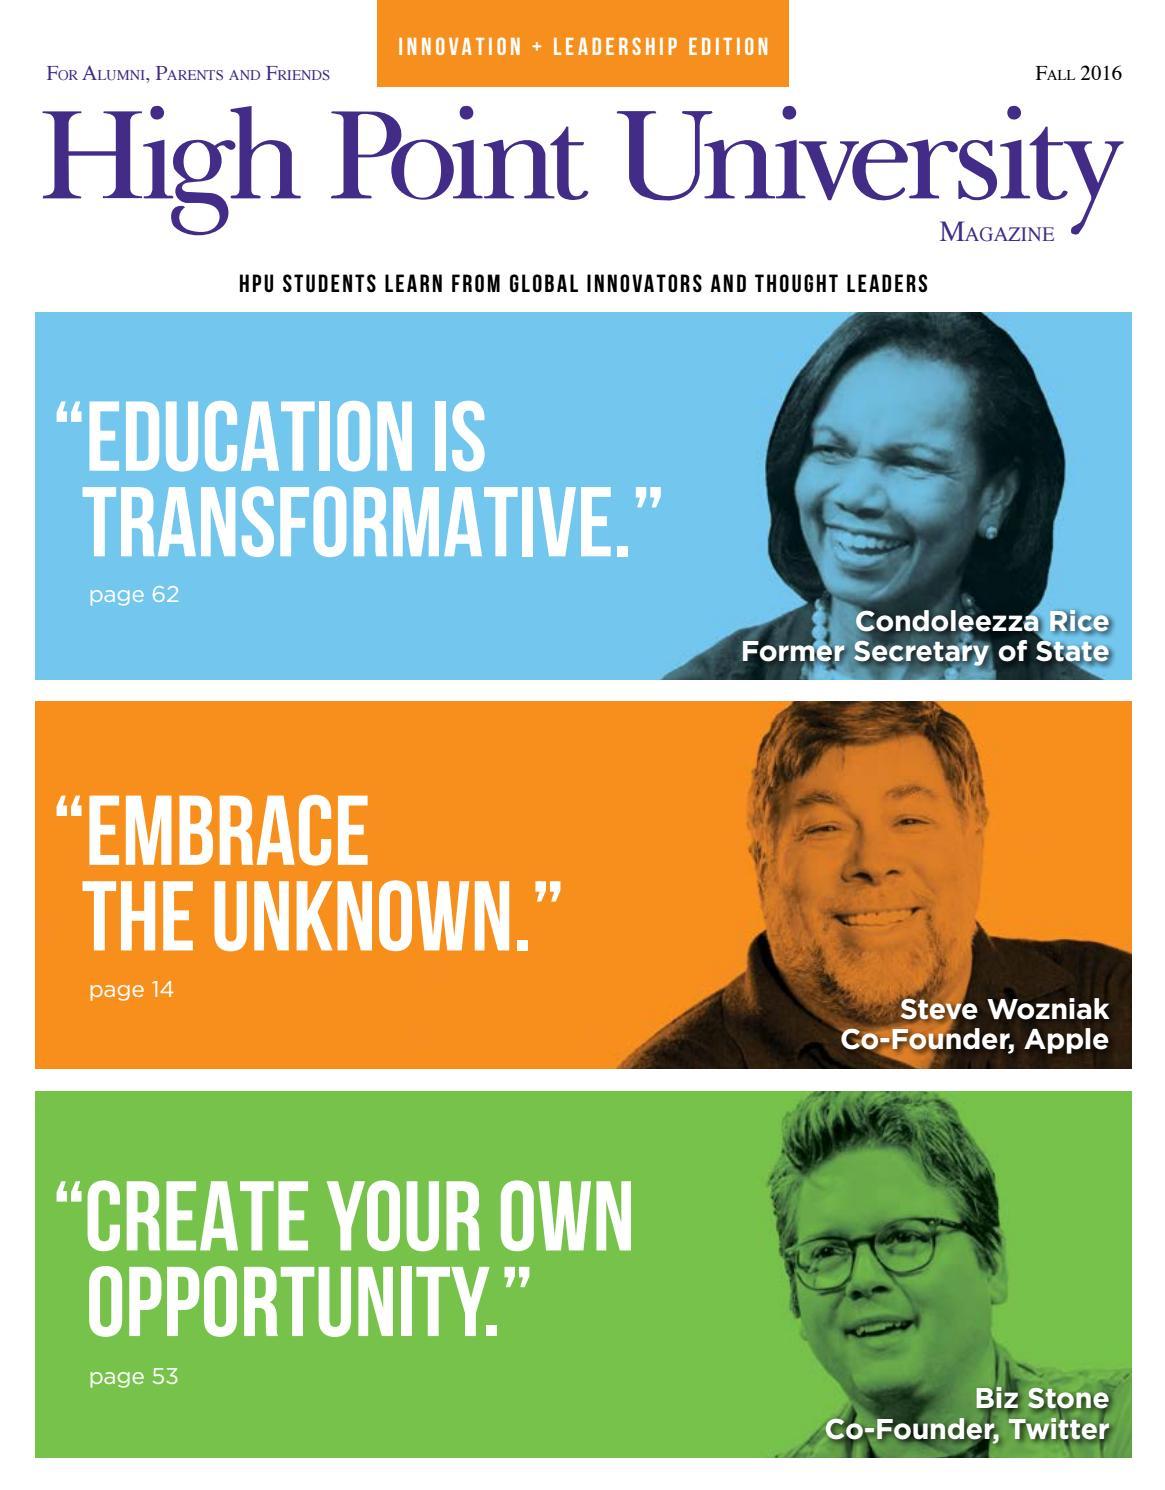 ca26124828c00 High Point University Magazine | Fall 2016 by High Point University - issuu